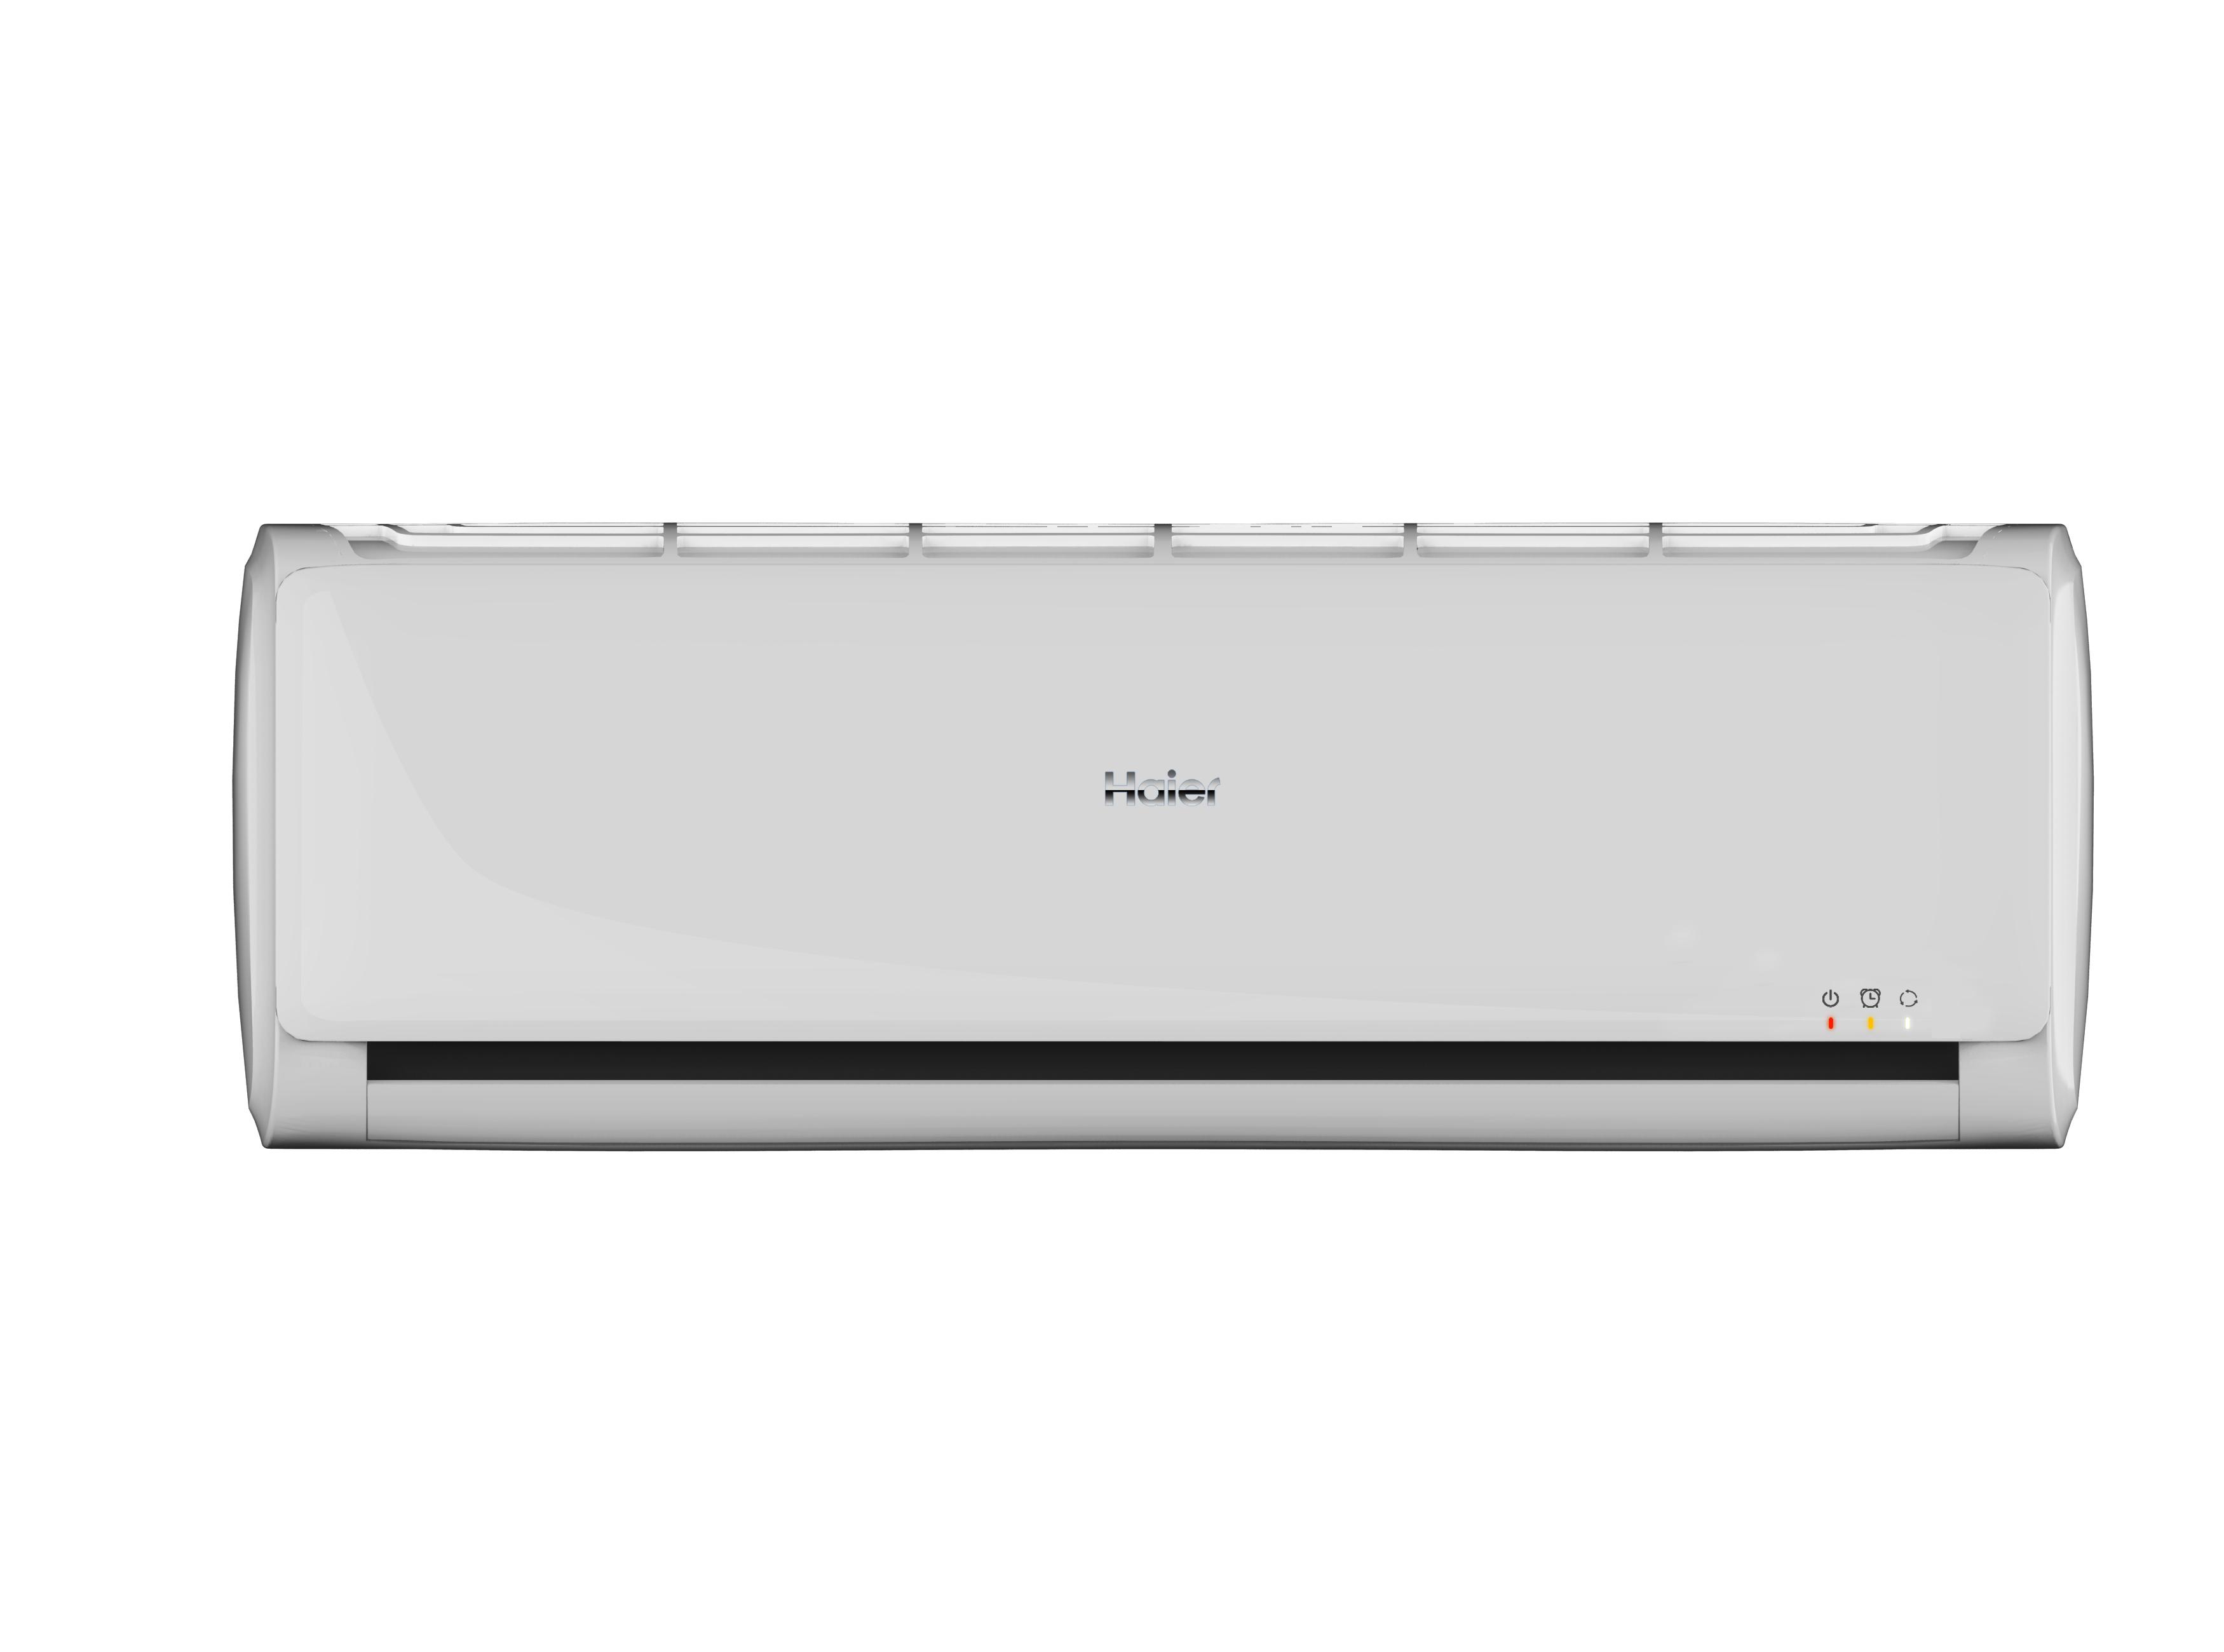 Aer Conditionat Haier 24000 btu Clasa A++ cu tehnologie Inverter